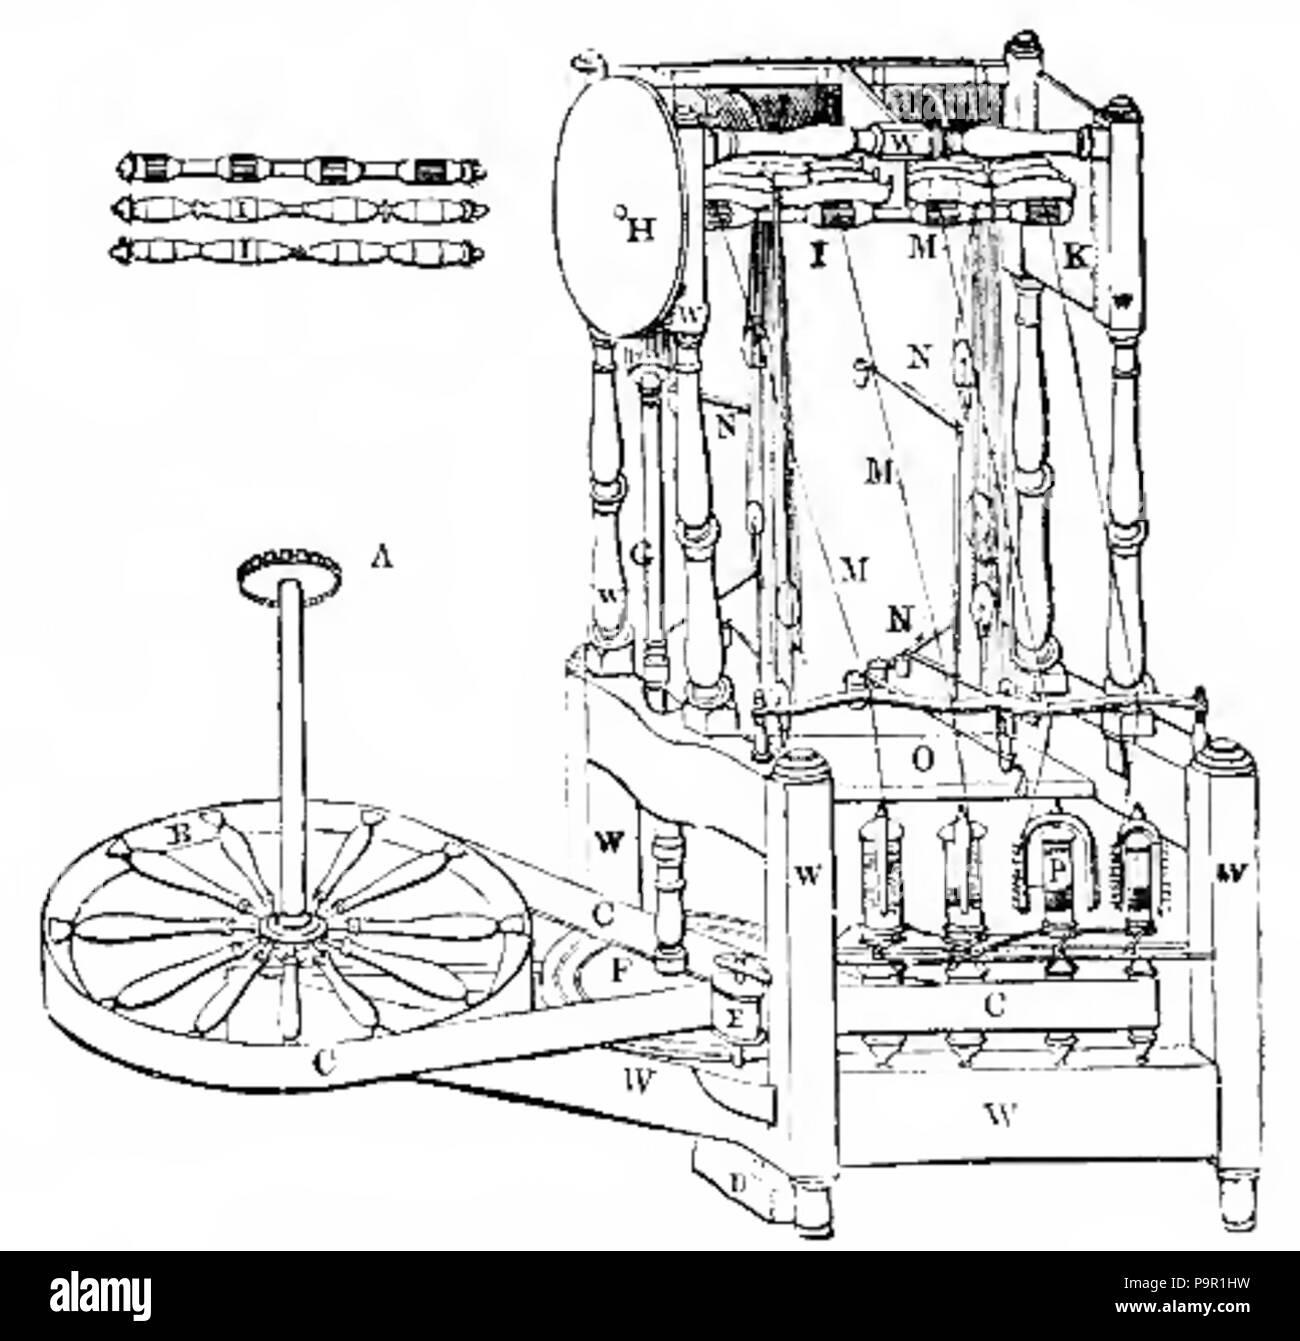 152 Arkwright Spinning frame Marsden 212 Stock Photo: 212562501 - Alamy